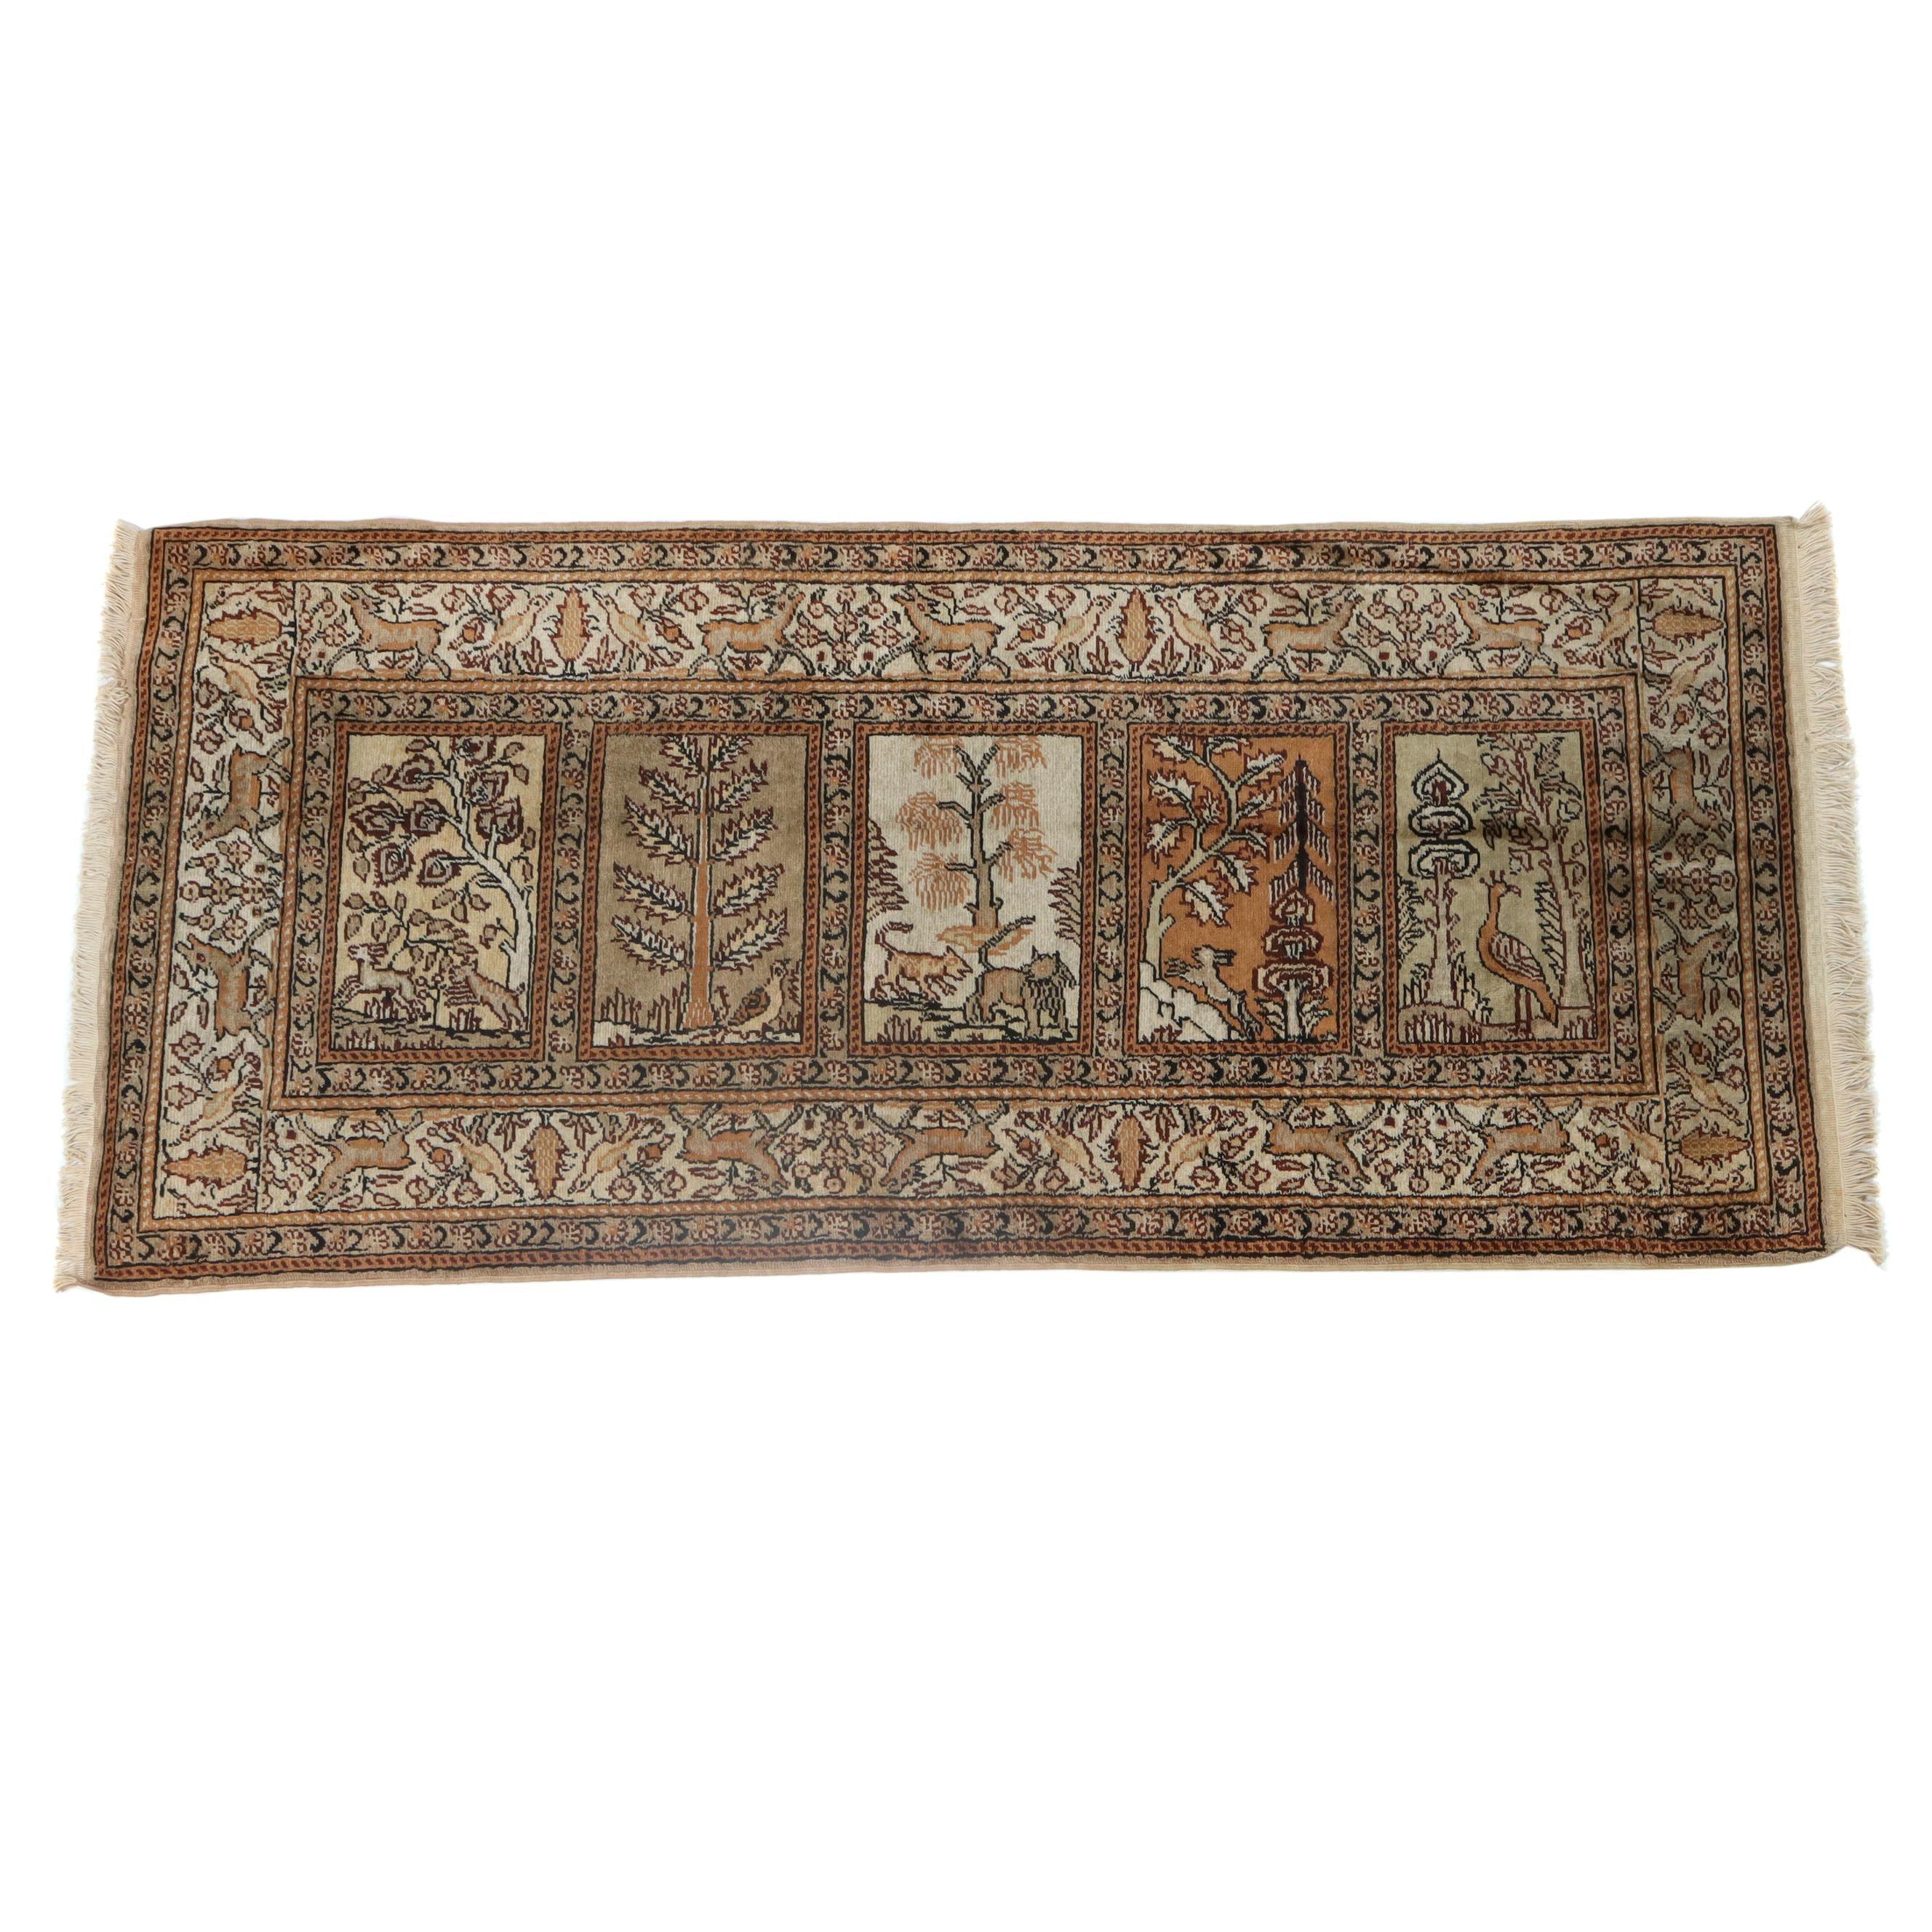 2.4' x 5.5' Hand-Knotted Turkish Kayseri Silk Pictorial Rug